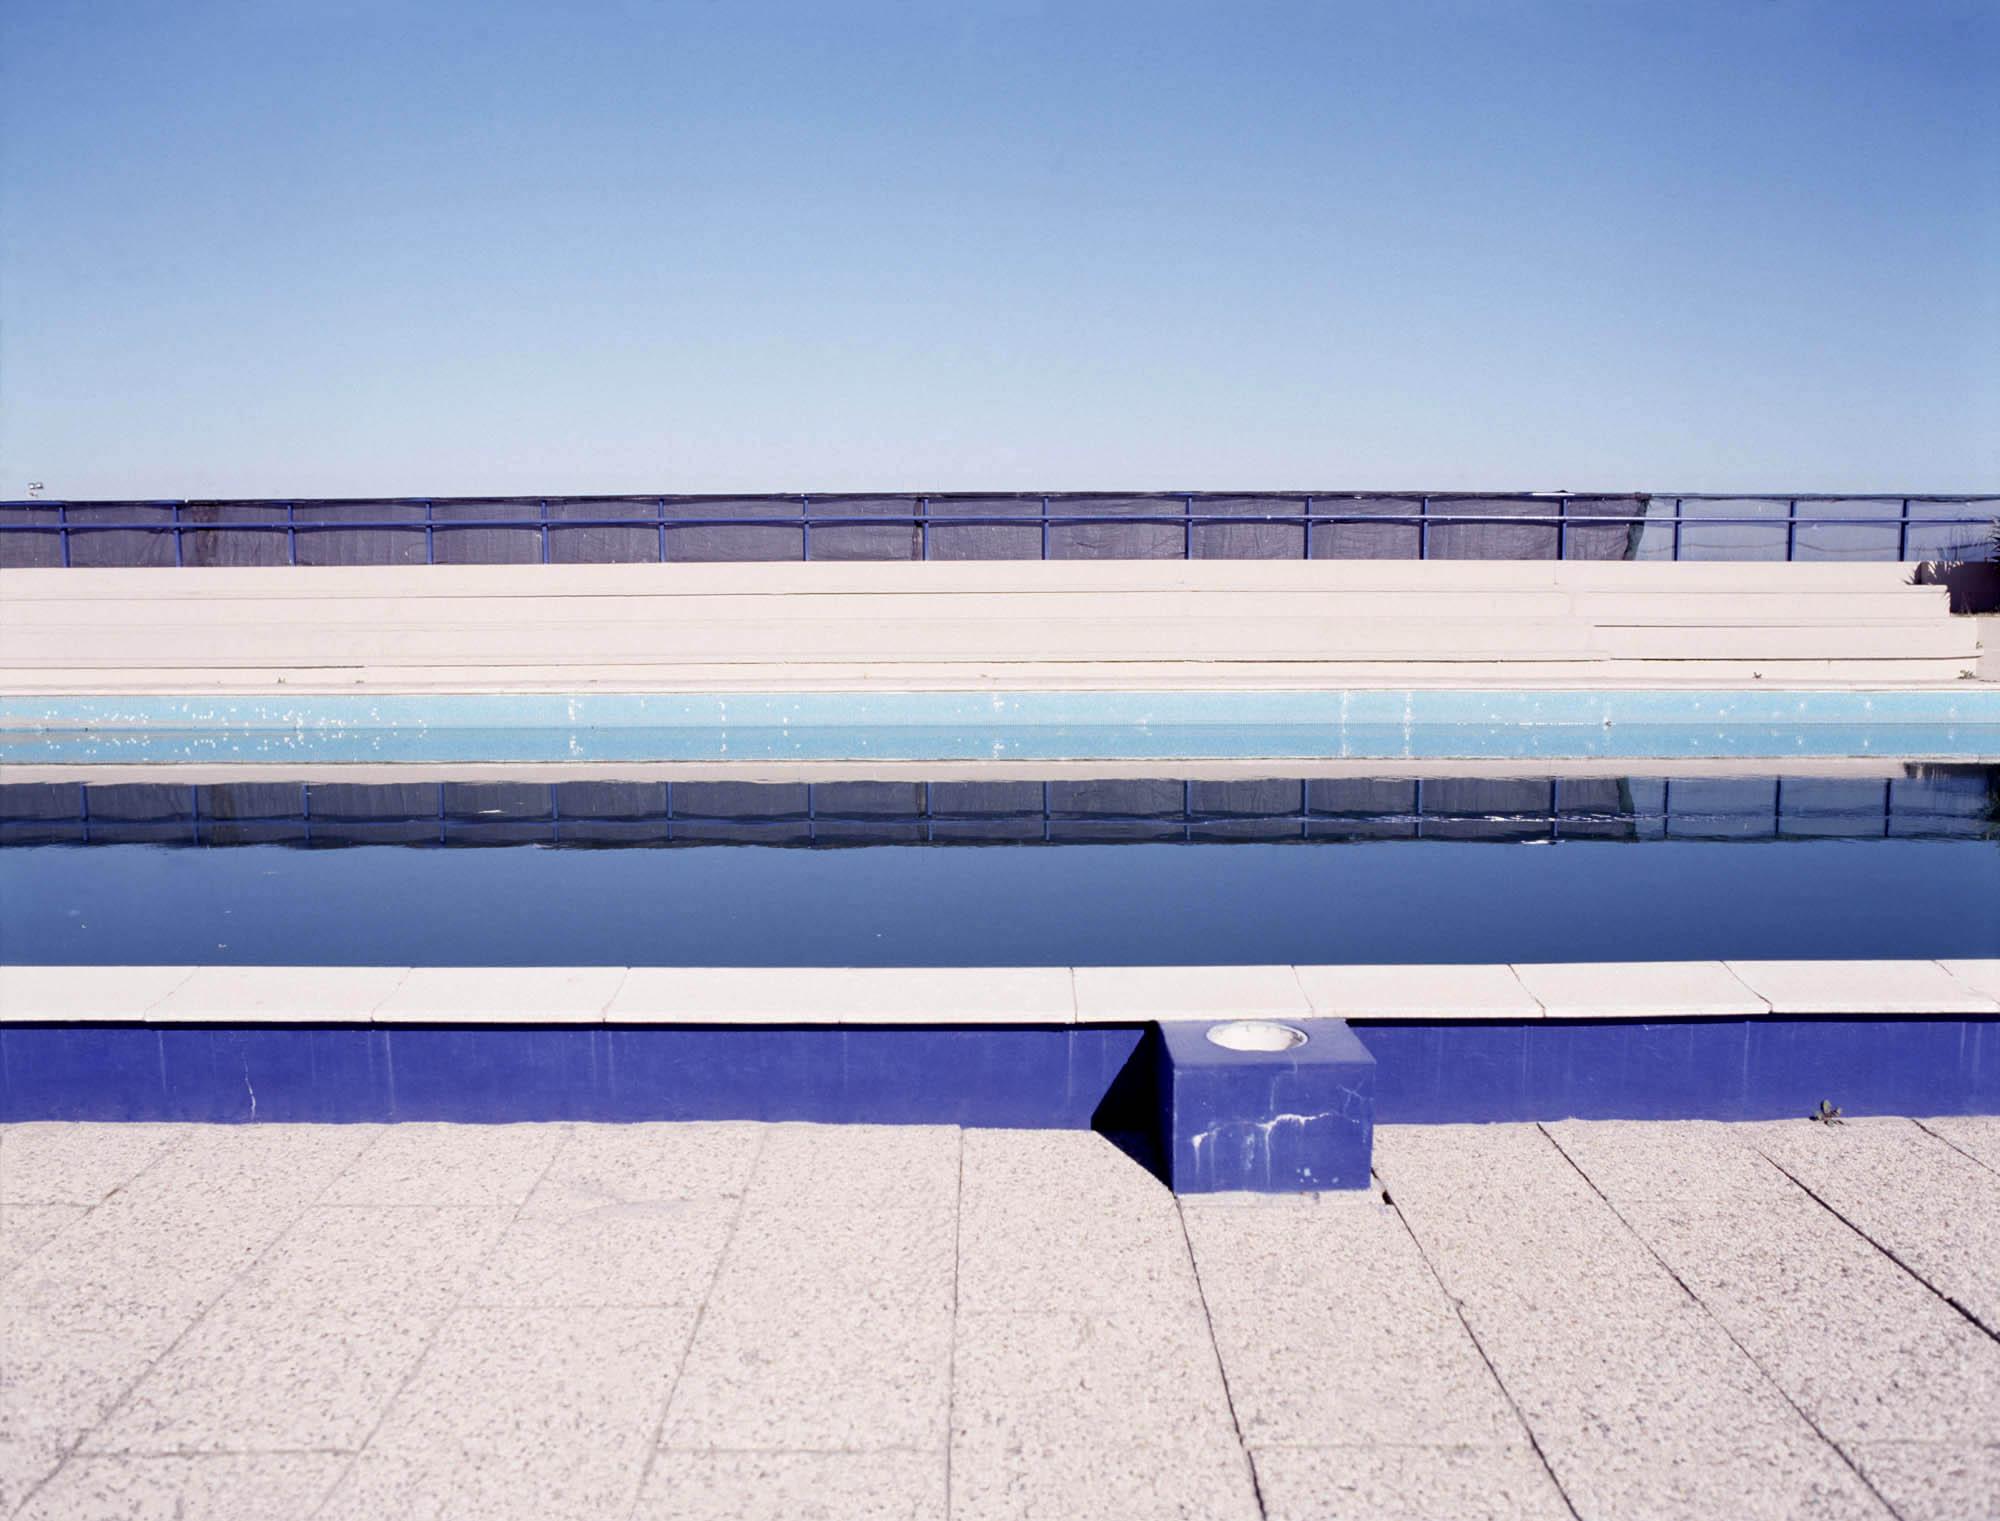 'Carabinieri Resort, Chioggia', Archival pigment print